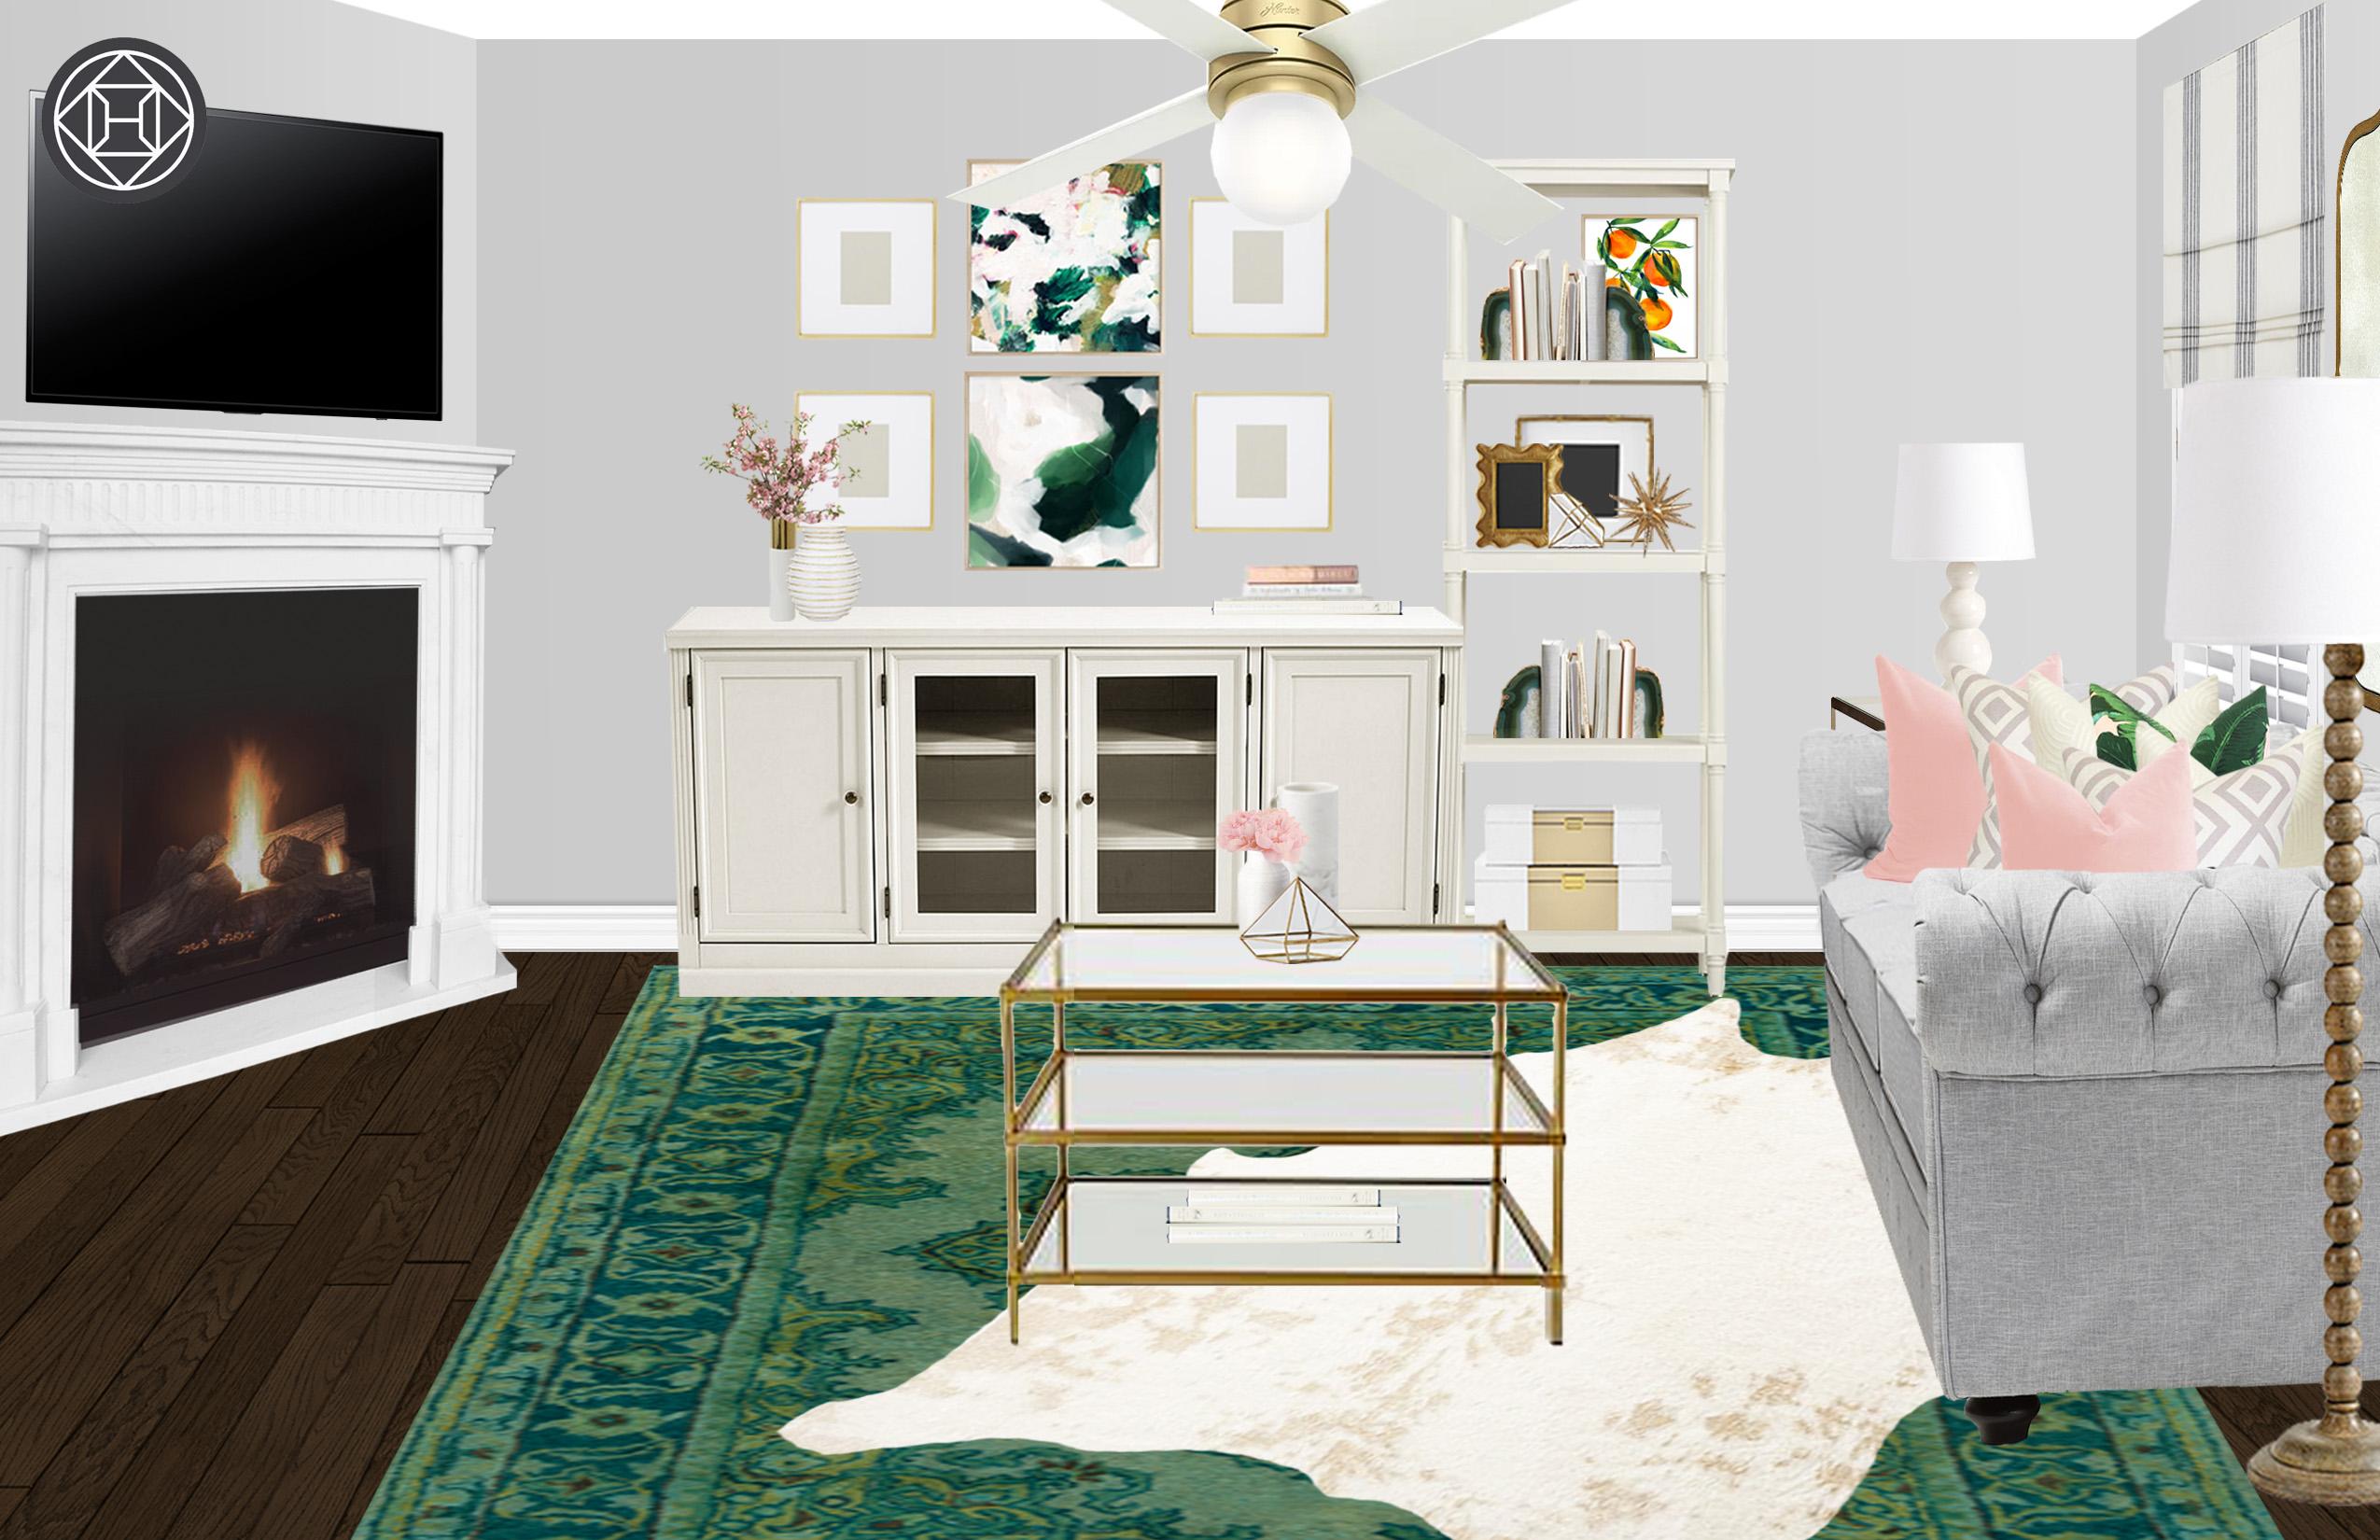 eclectic, coastal, glam living room designhavenly interior